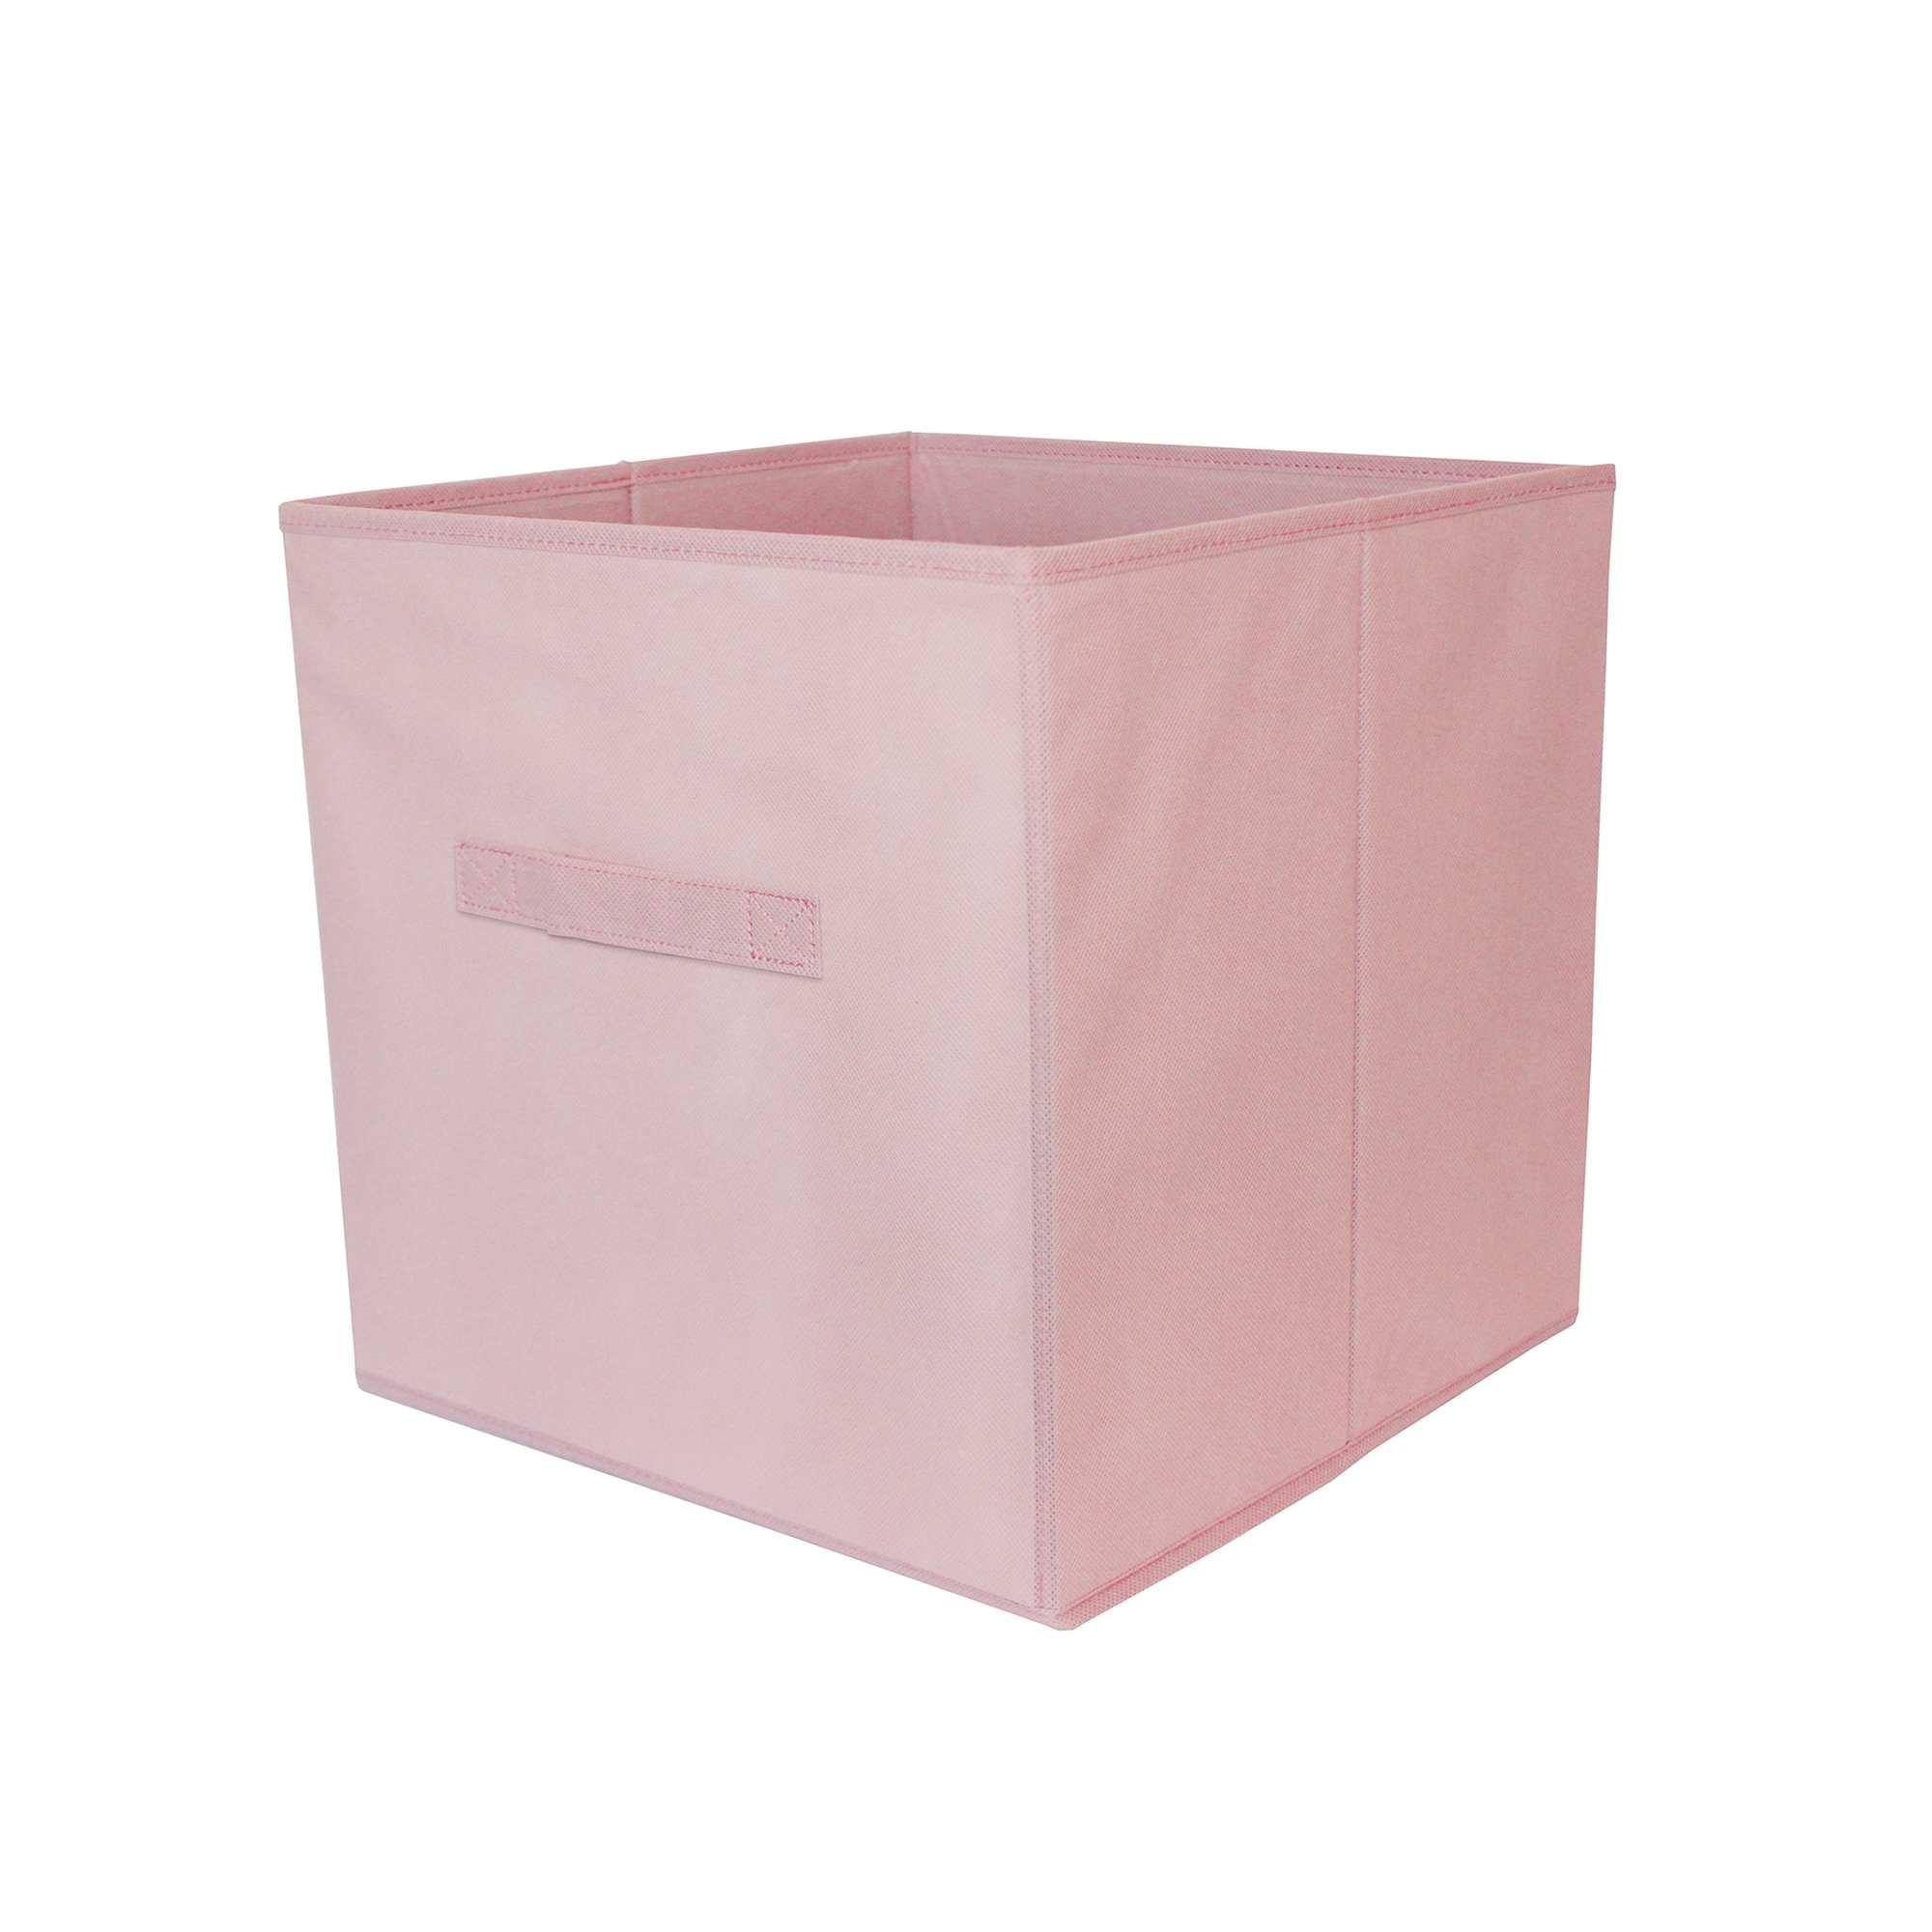 panier pliable intiss linge de lit rose p le kiabi 4 00. Black Bedroom Furniture Sets. Home Design Ideas